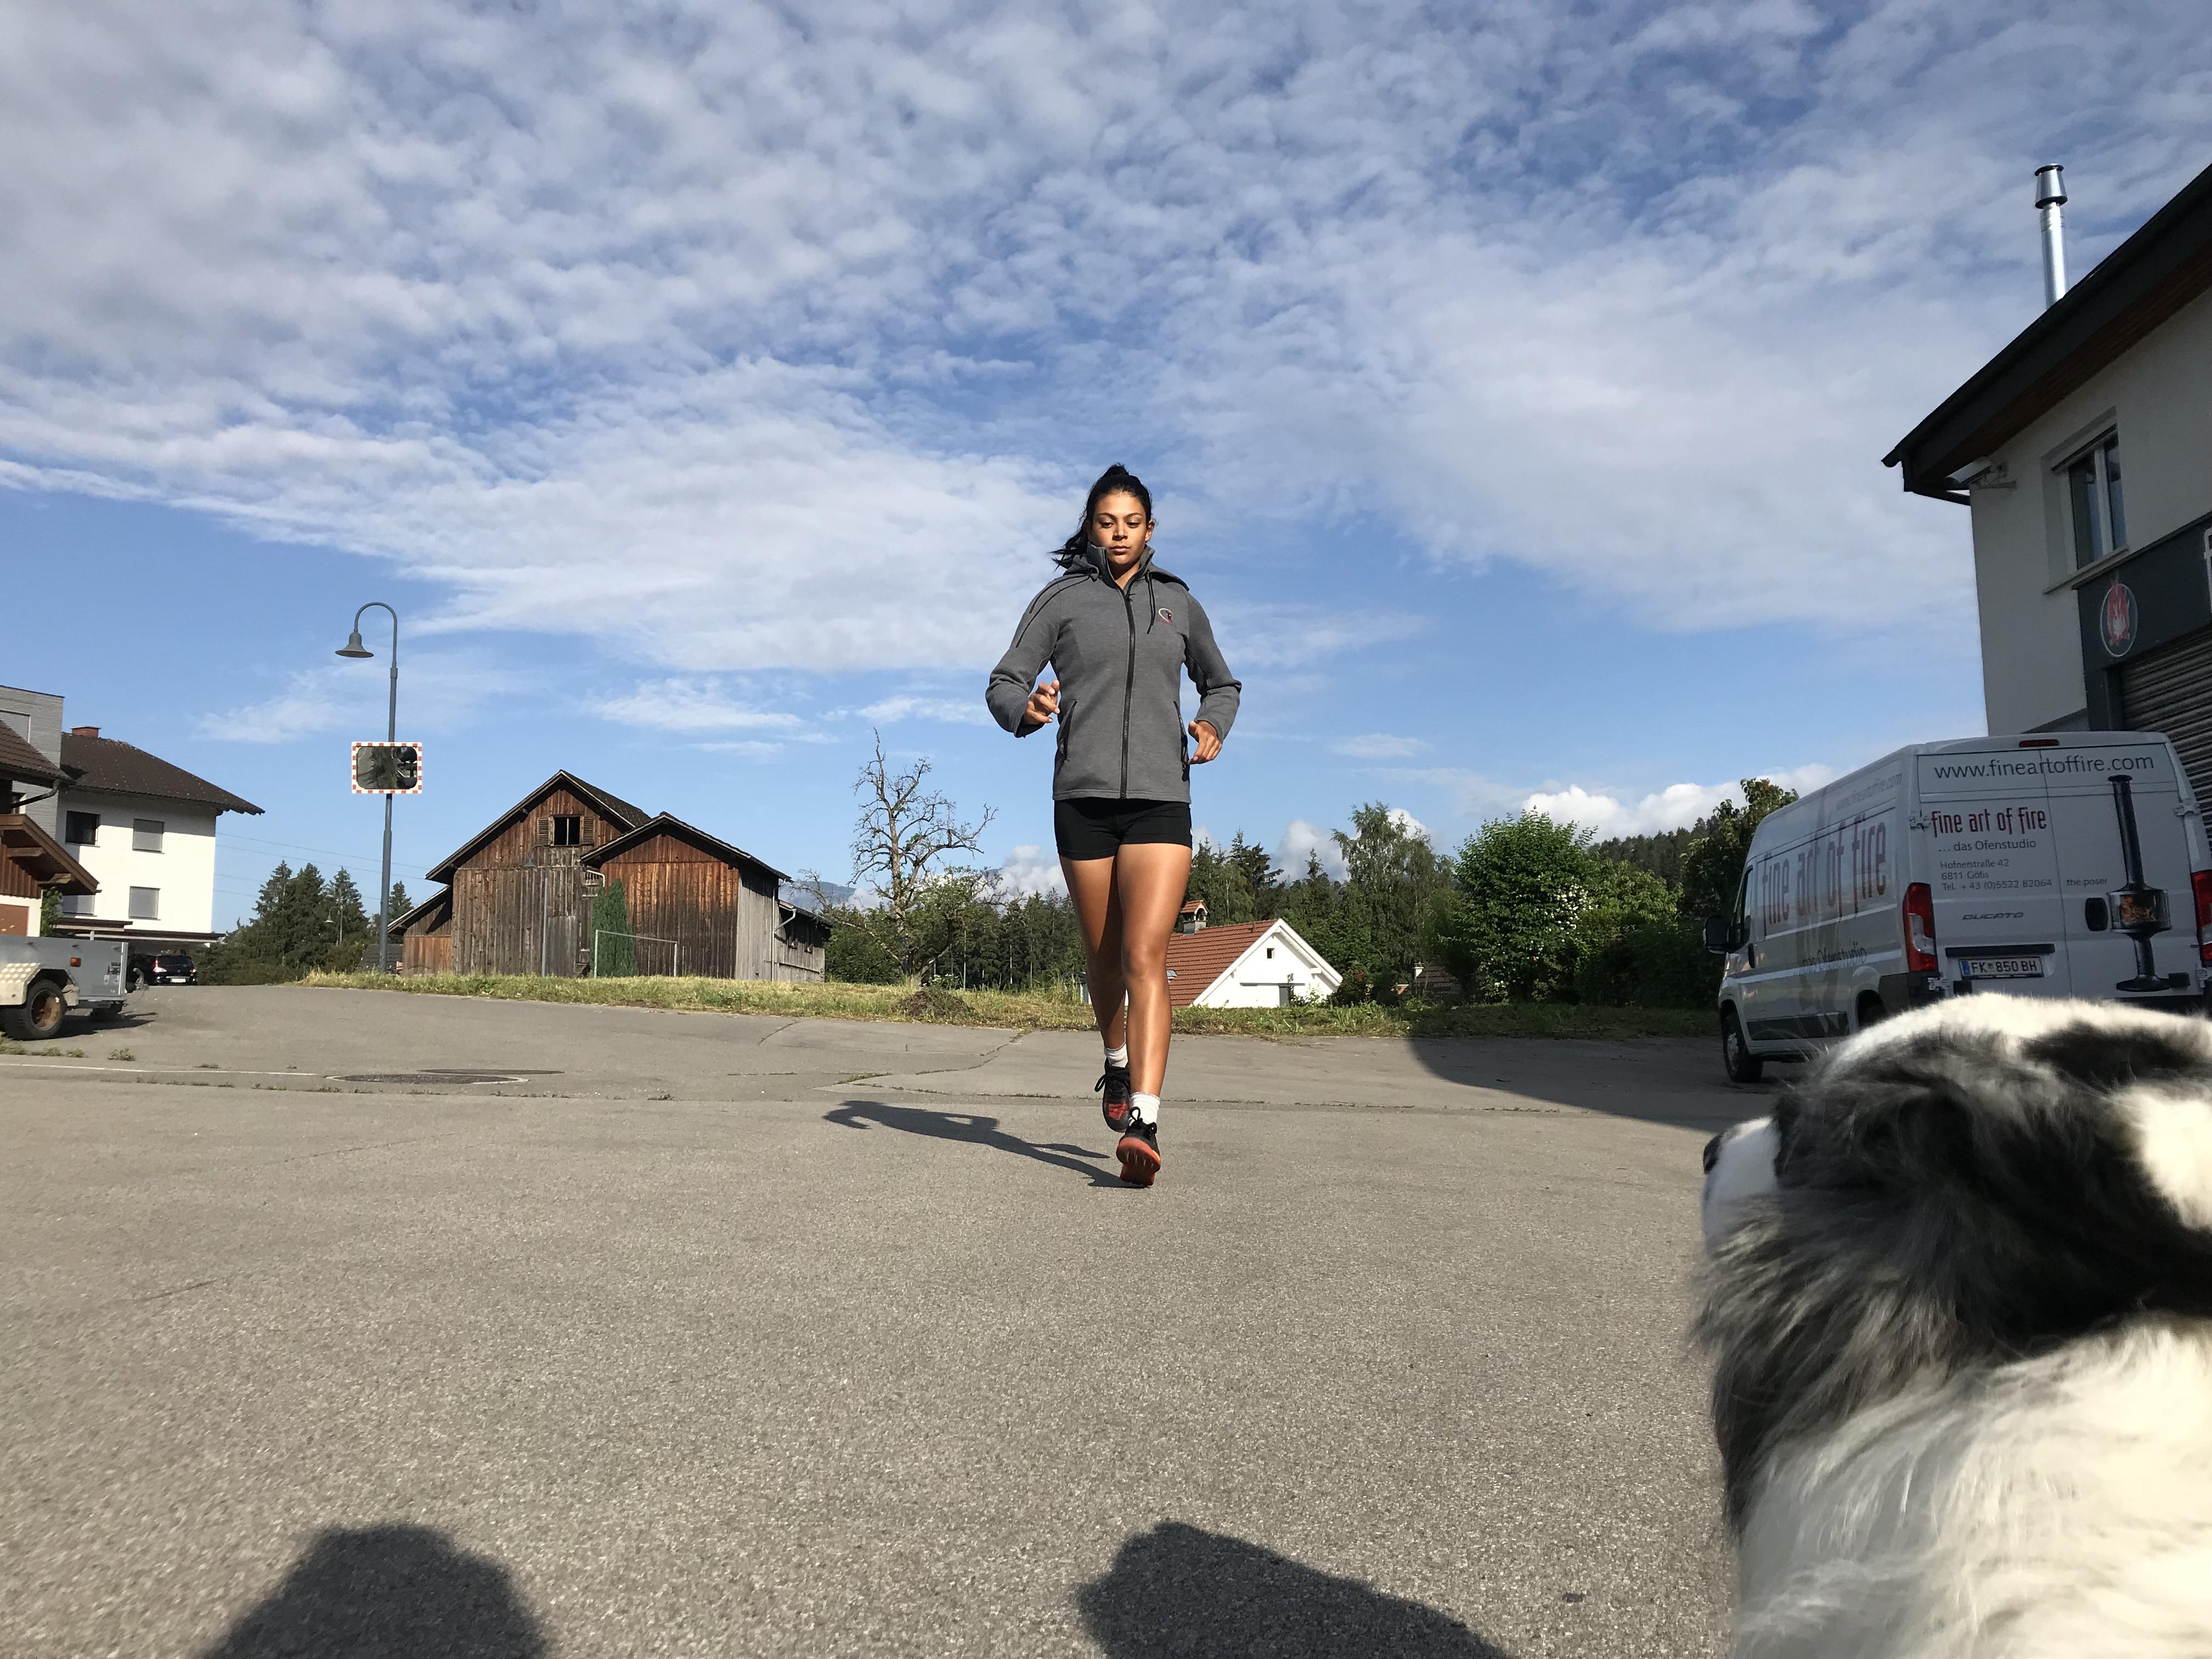 Chantal Düringer beim Aufwärmen vor dem Training; Foto: ©Chantal Düringer